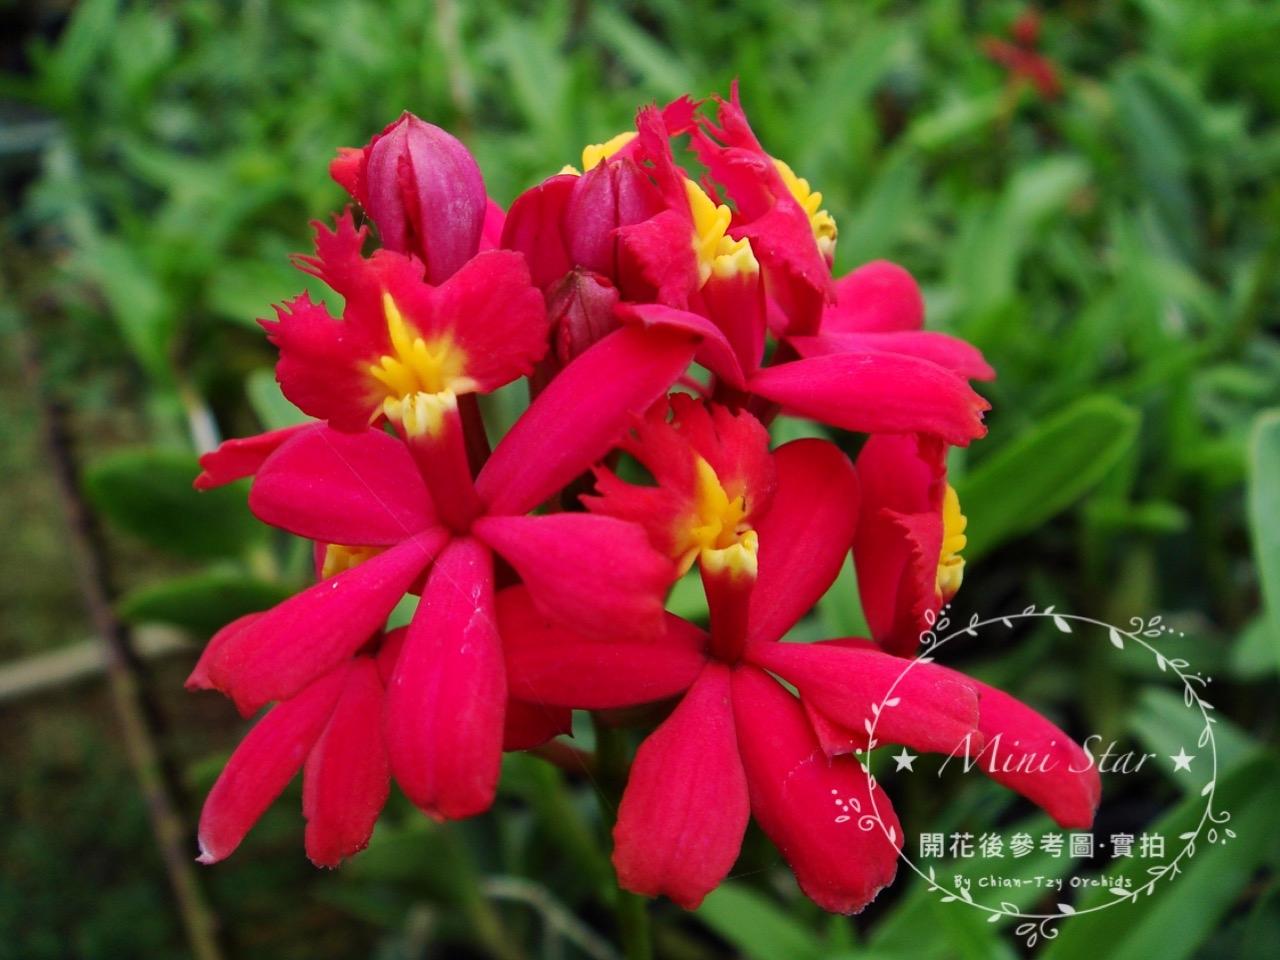 ★Mini Star★ 千姿蘭園Chian-Tzy Orchids  樹蘭 Epi.-千姿紅星